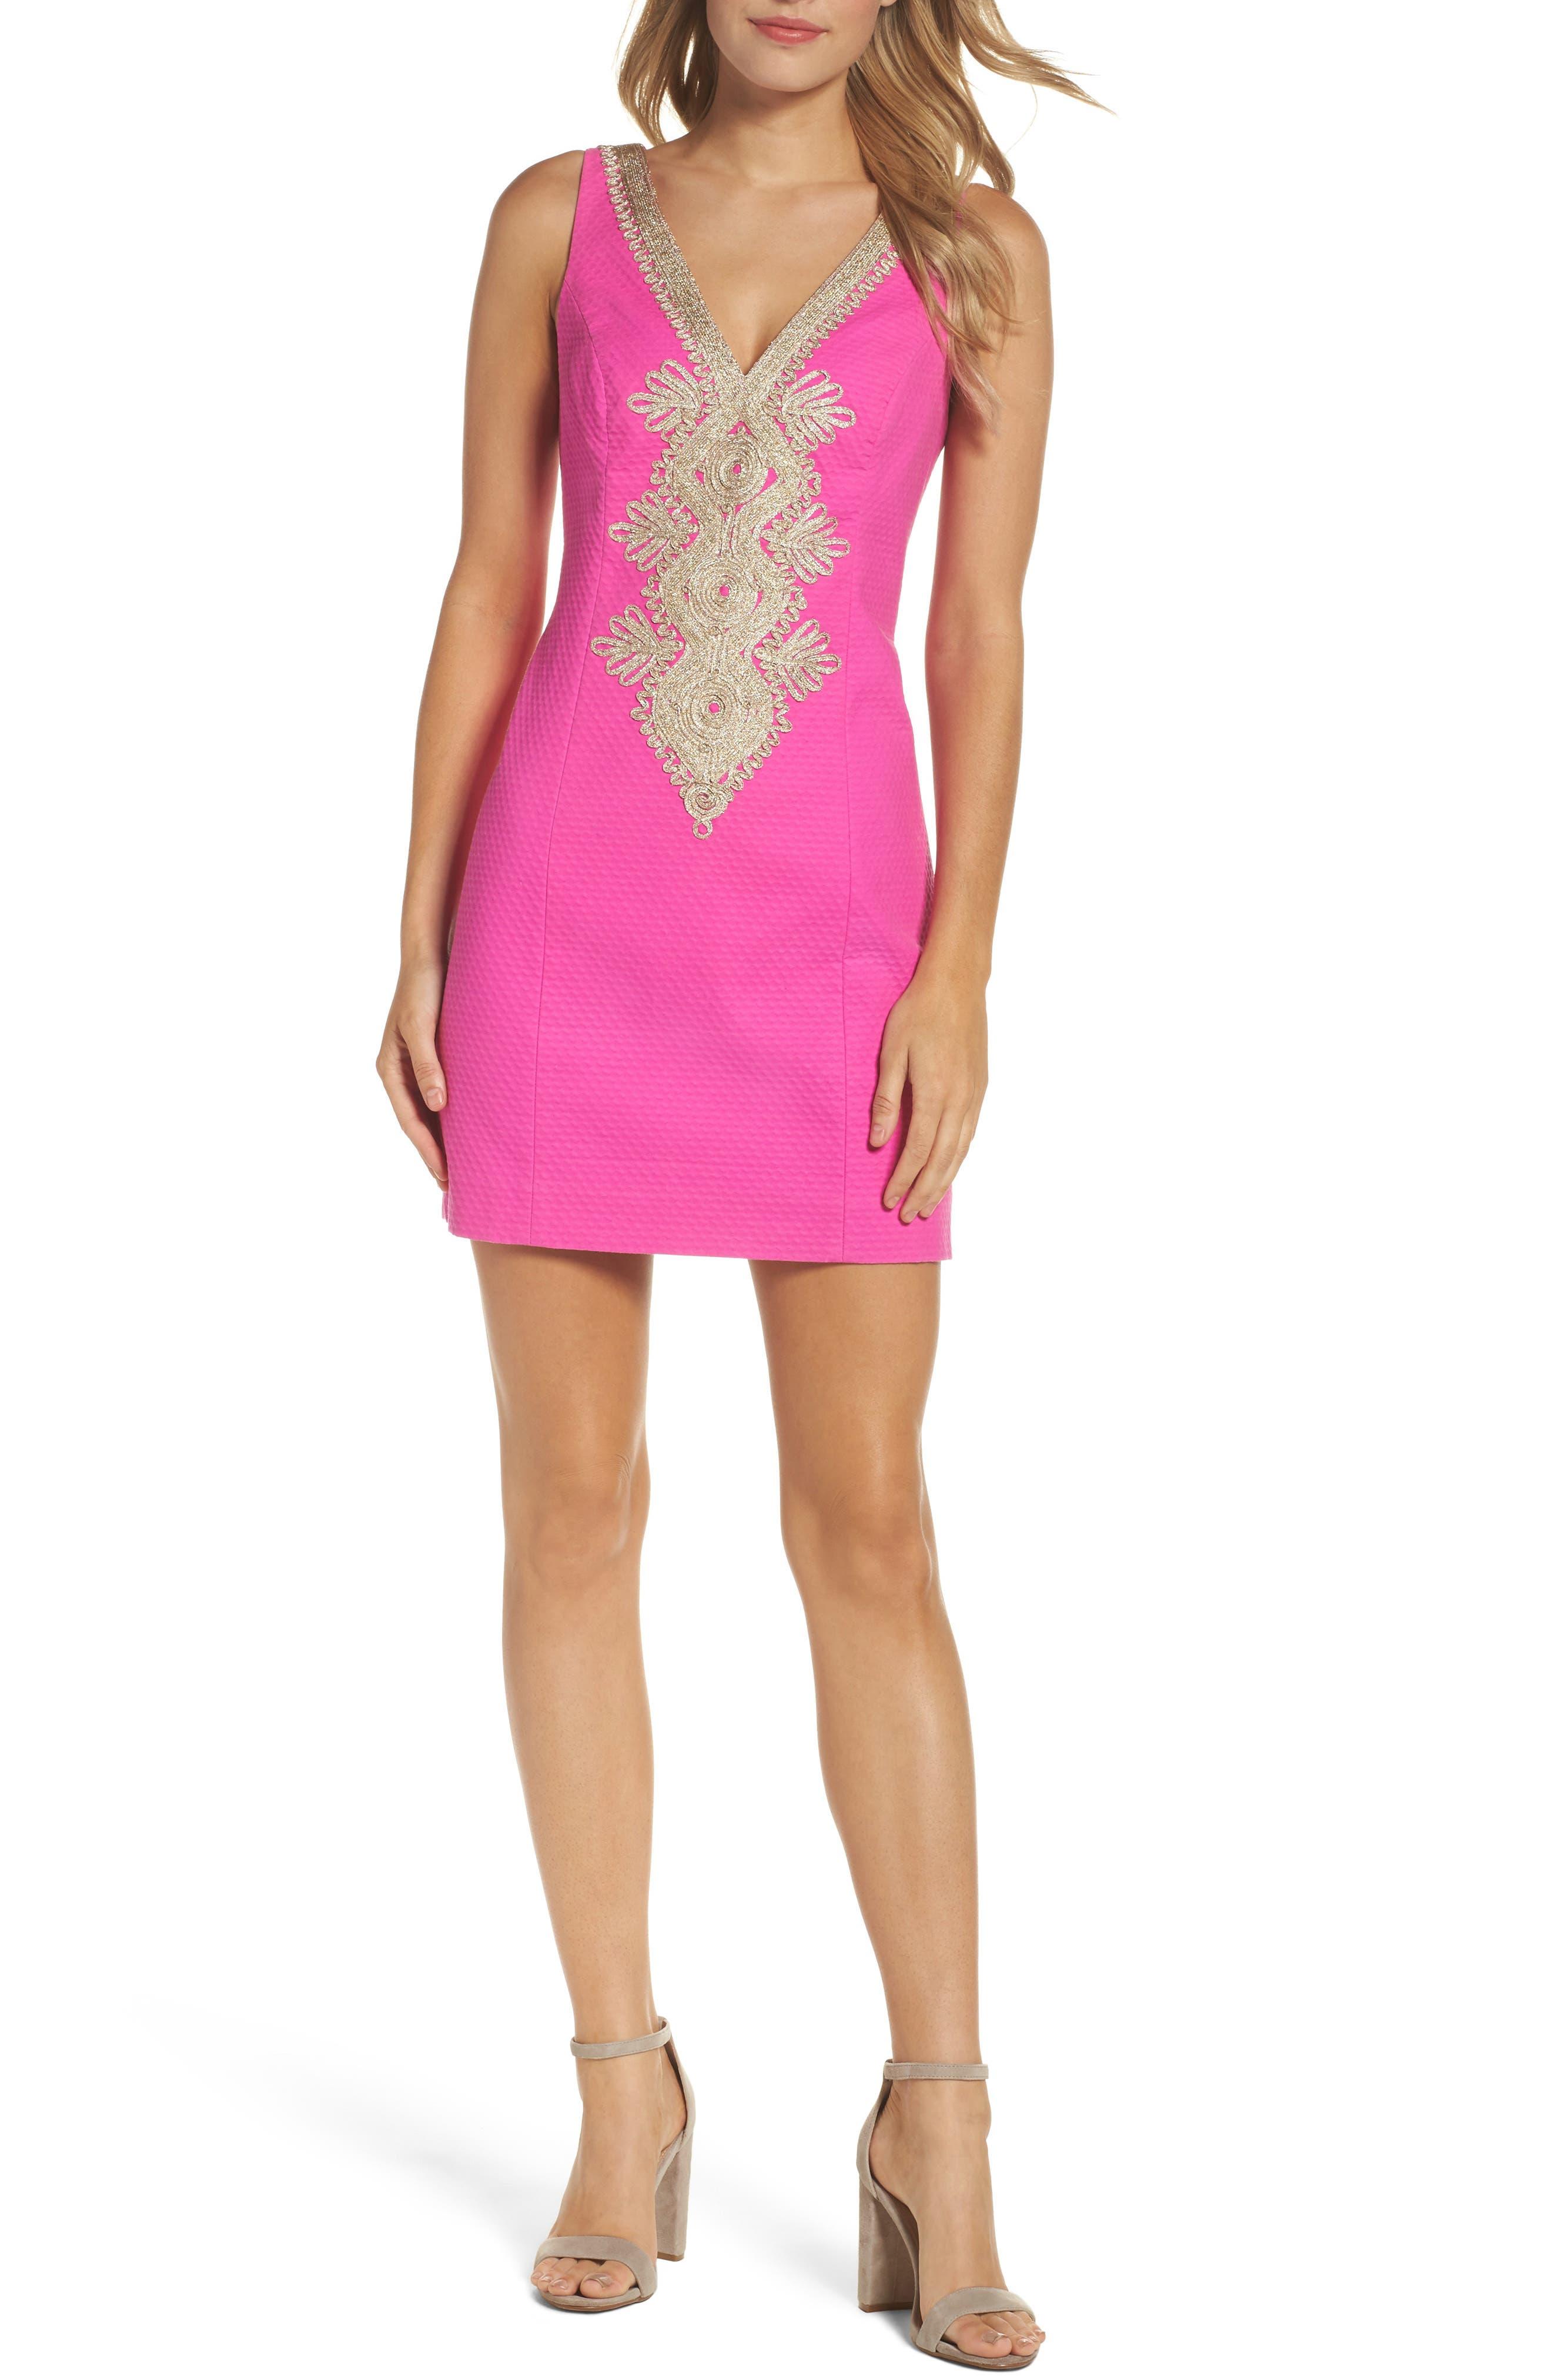 Junie Embroidered Sheath Dress,                             Main thumbnail 1, color,                             500